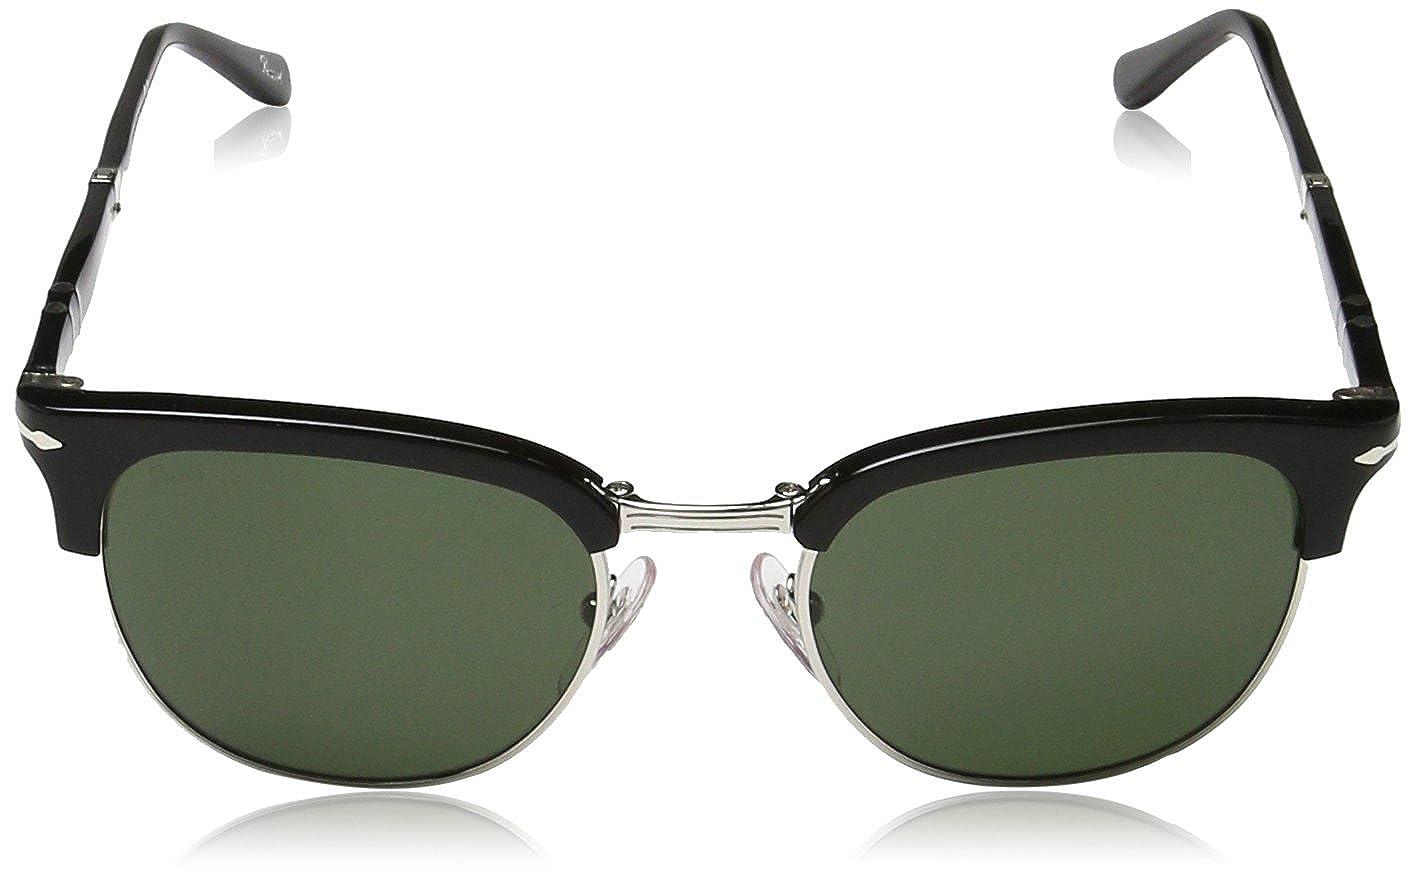 3aa5f3fccc548 Persol Unisex-Adult s 0PO3132S Sunglasses